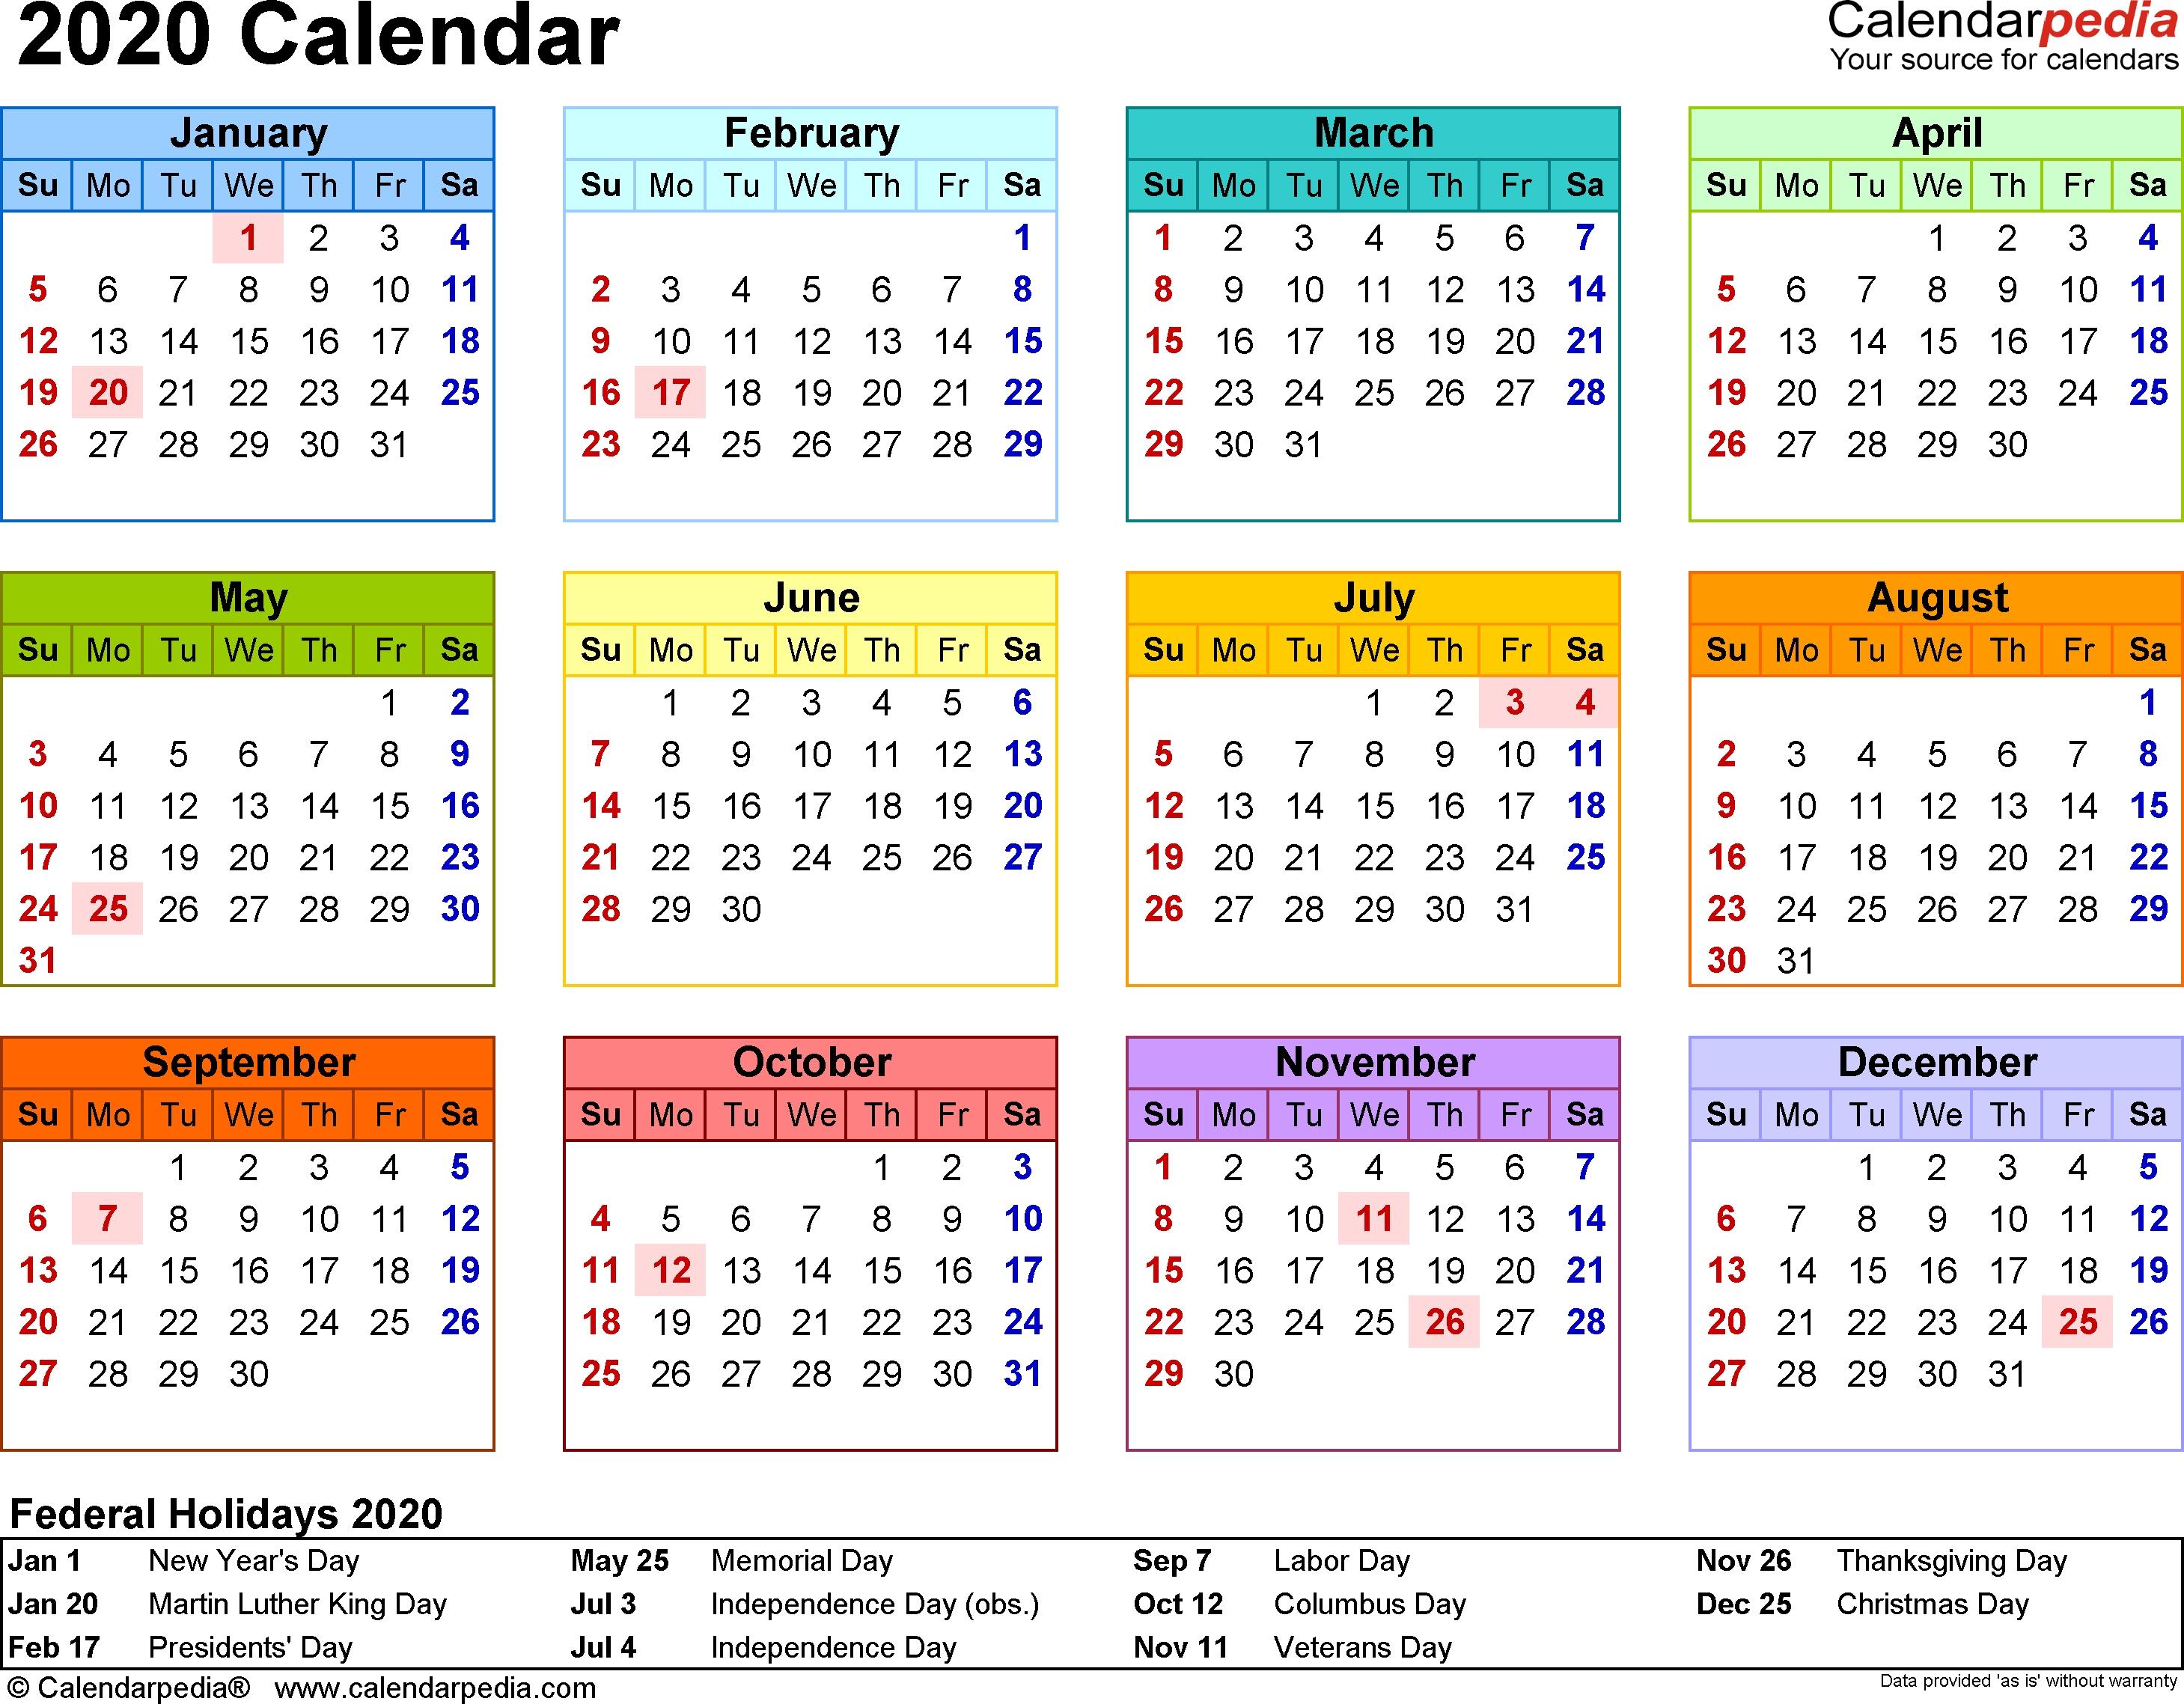 2020 Calendar - Download 17 Free Printable Excel Templates (.xlsx) Exceptional 2020 Calendar Nz Public Holidays